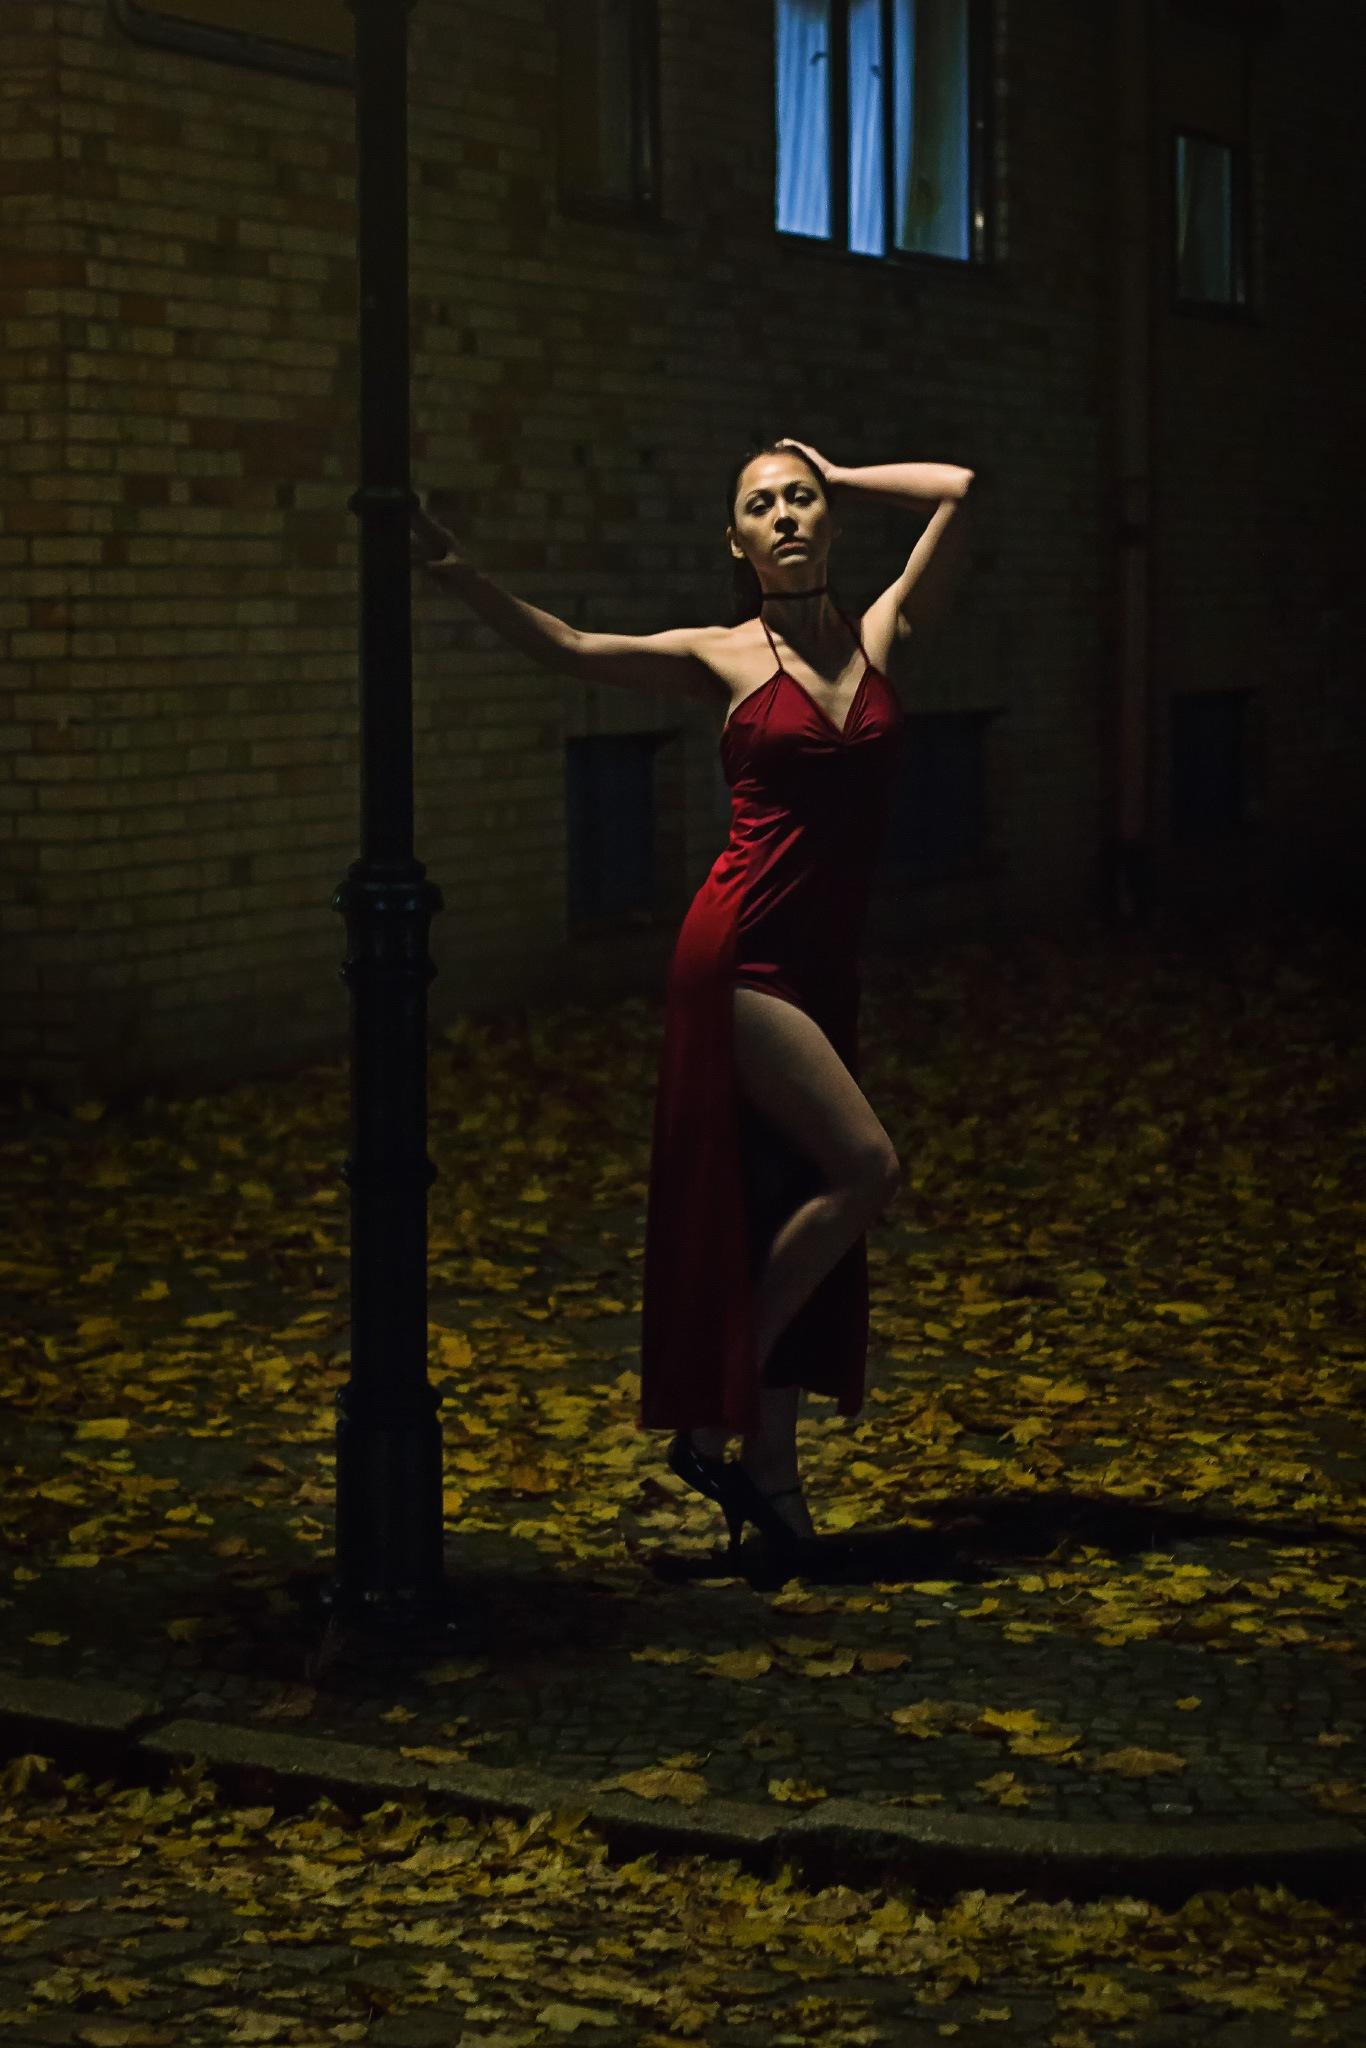 Lantern Lady by Arno Bauermeister